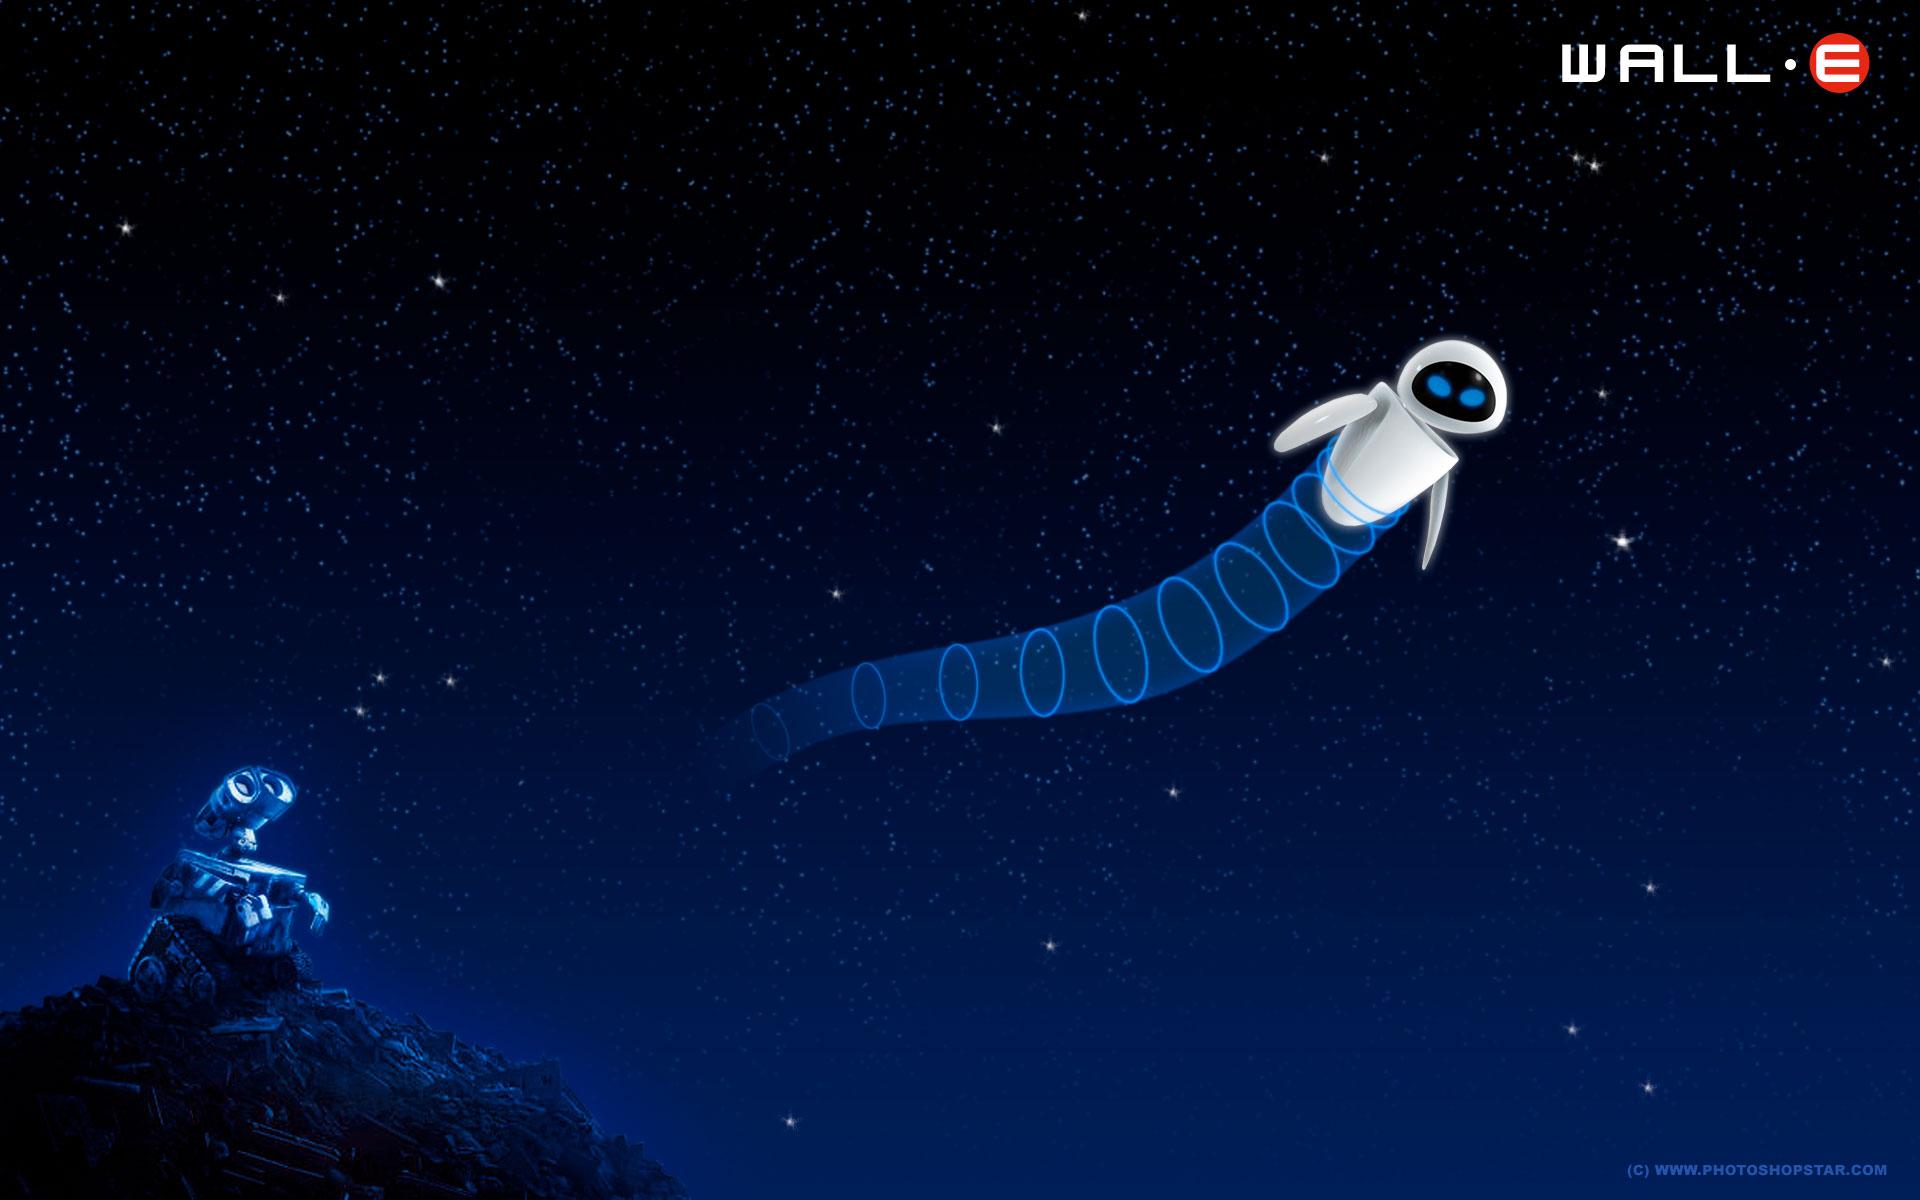 Wall-E Cartoon Style Wallpaper